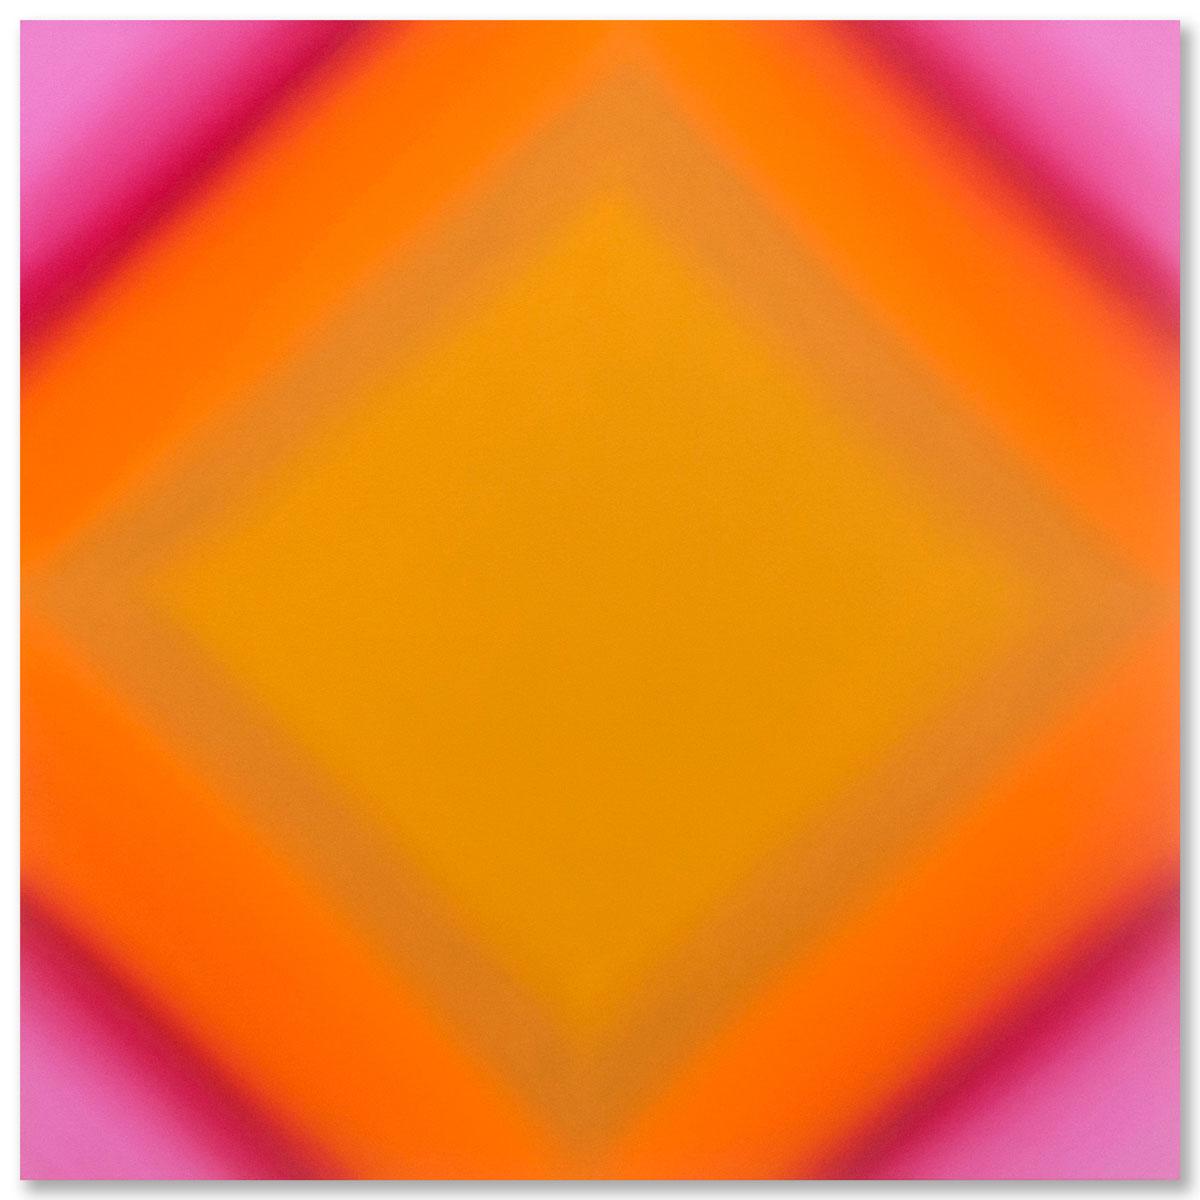 Matter of Light 2-S4848, (Red Green), Matter of Light Series, 2016, oil on canvas on custom beveled stretcher, 48 x 48 x 3 inc. (122 x 122 x 7 cm.)